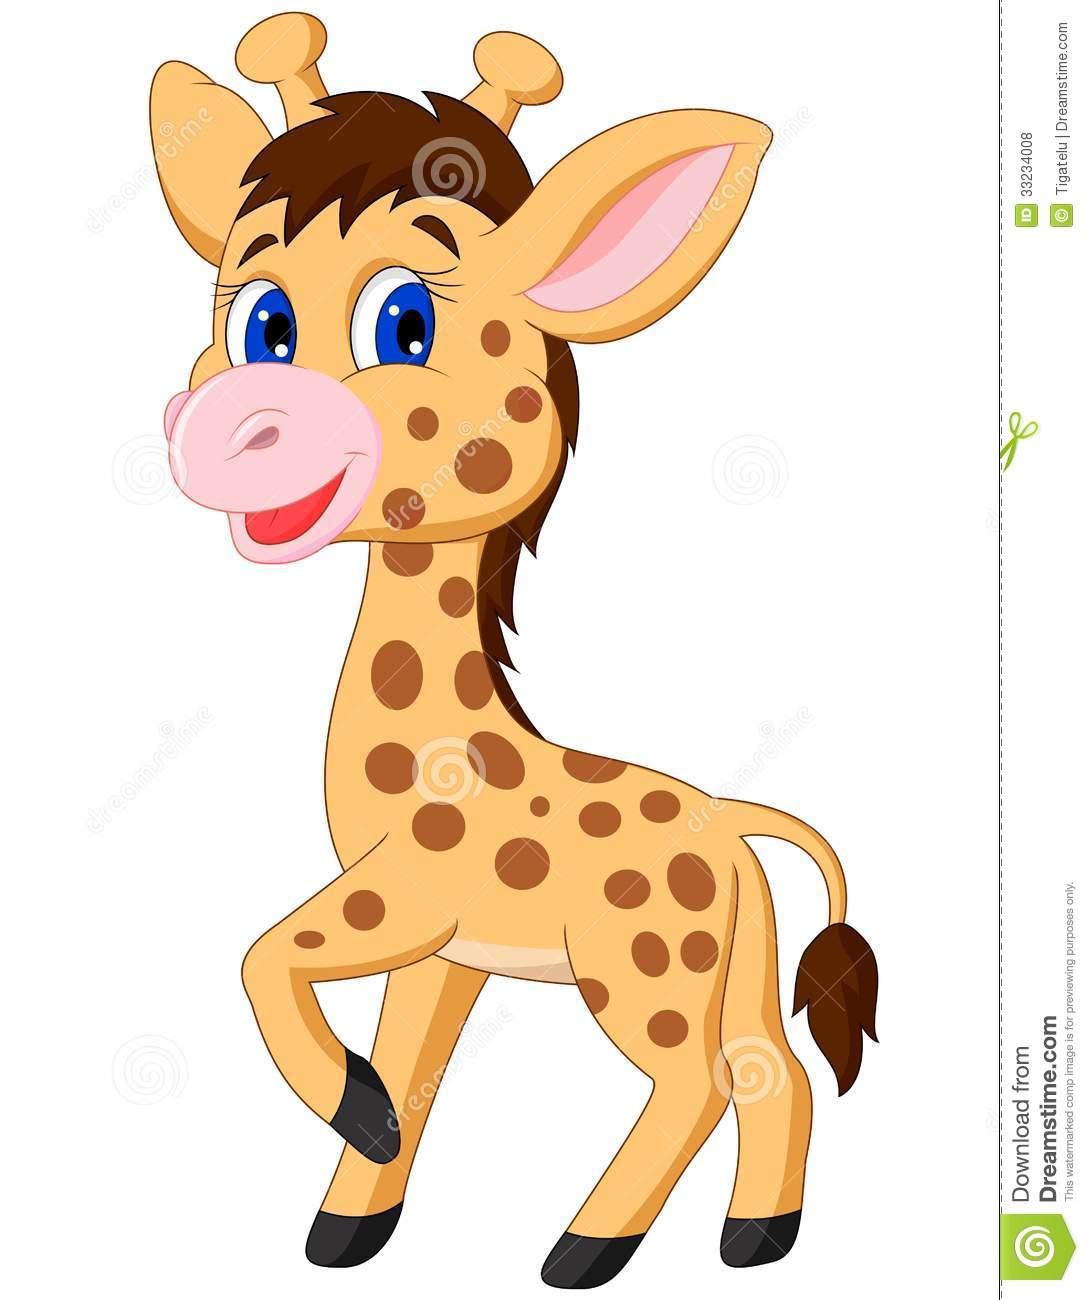 free clipart of giraffe - photo #48